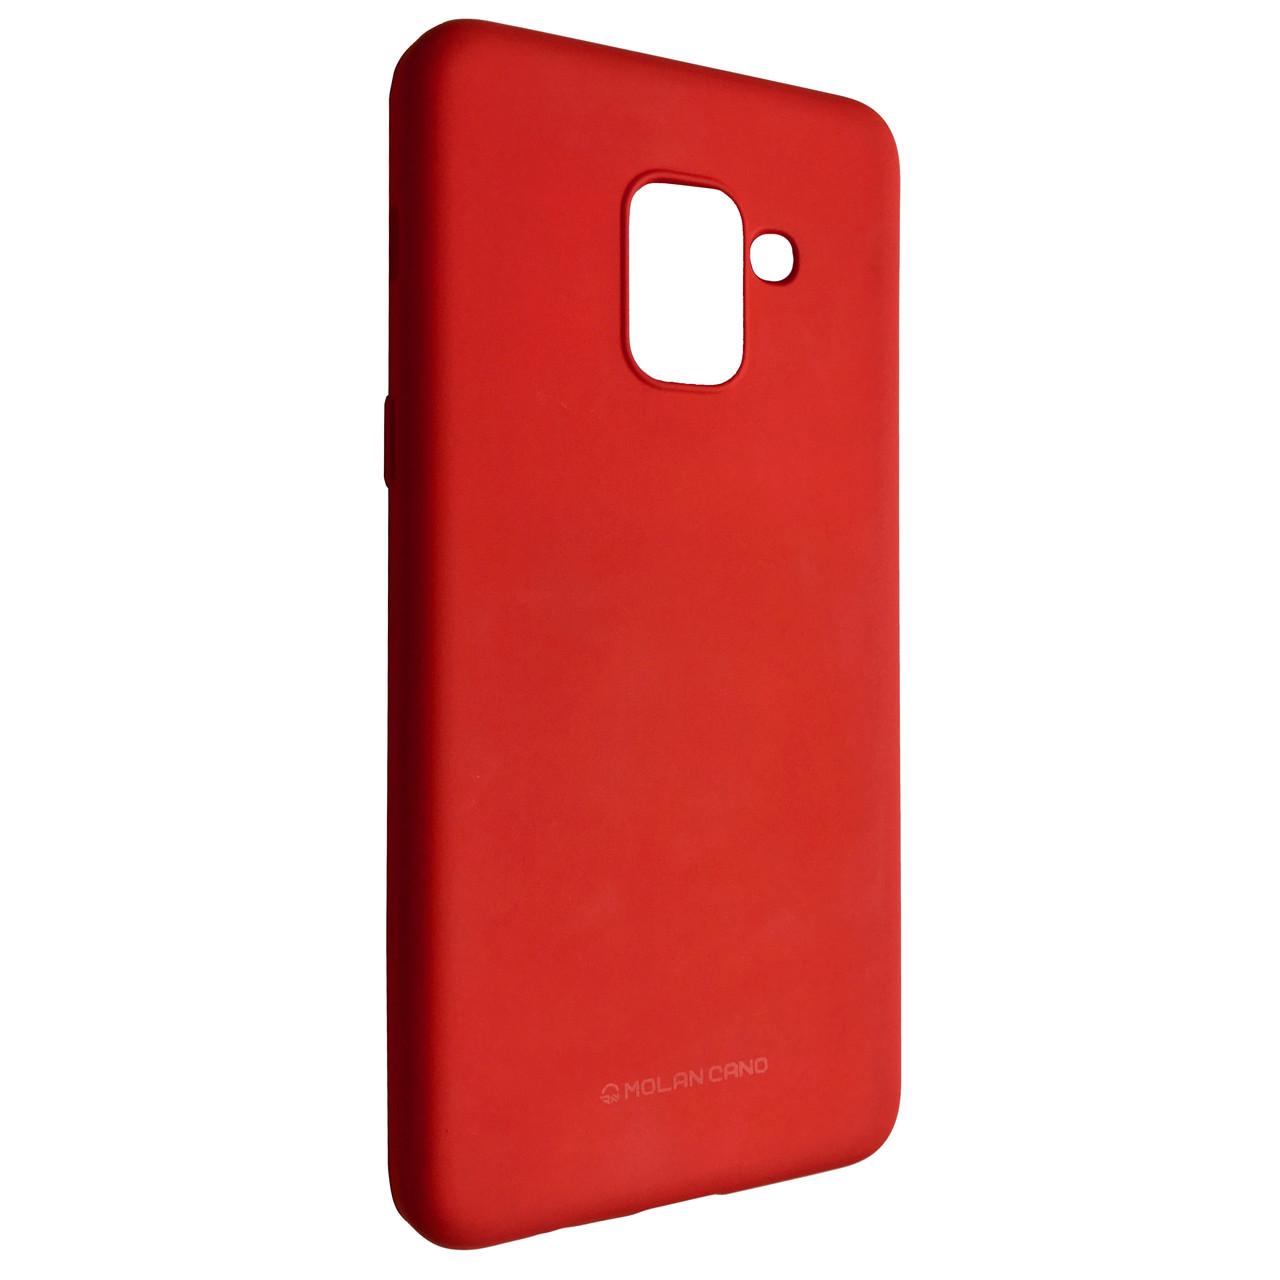 Чехол Hana Molan Cano Samsung A8 Plus (red)